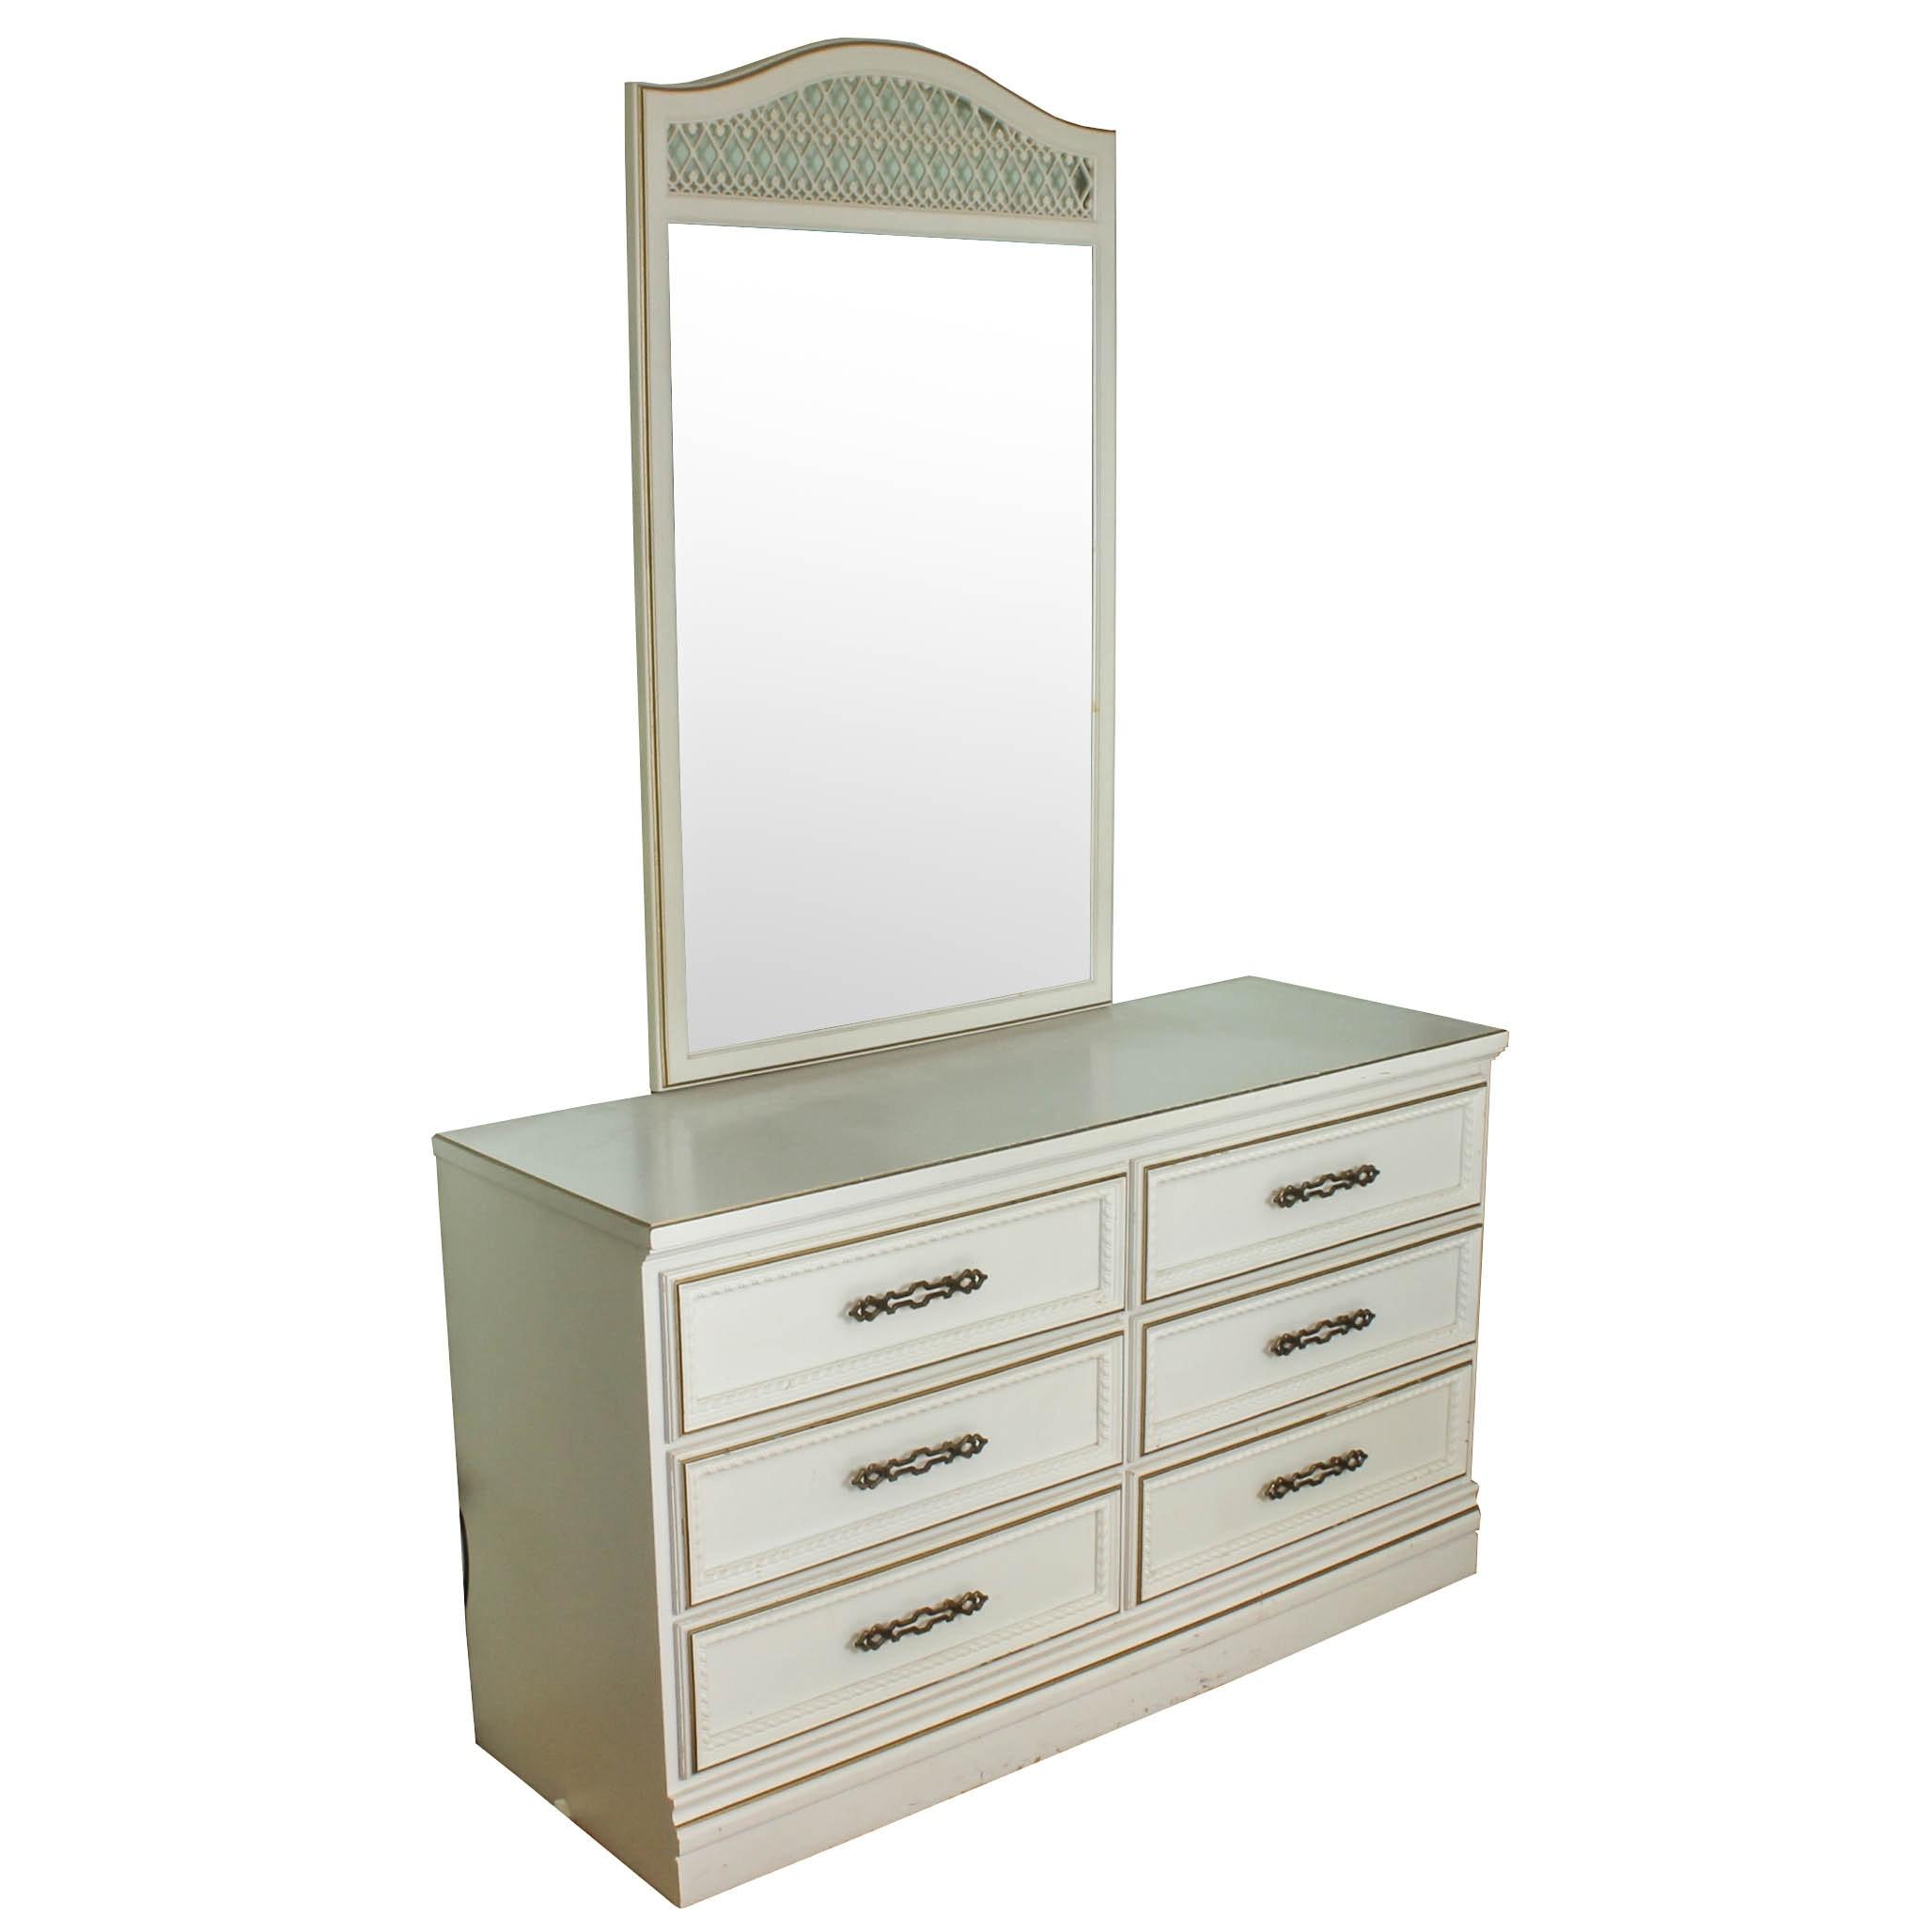 Vintage Mid-Century Dresser and Mirror